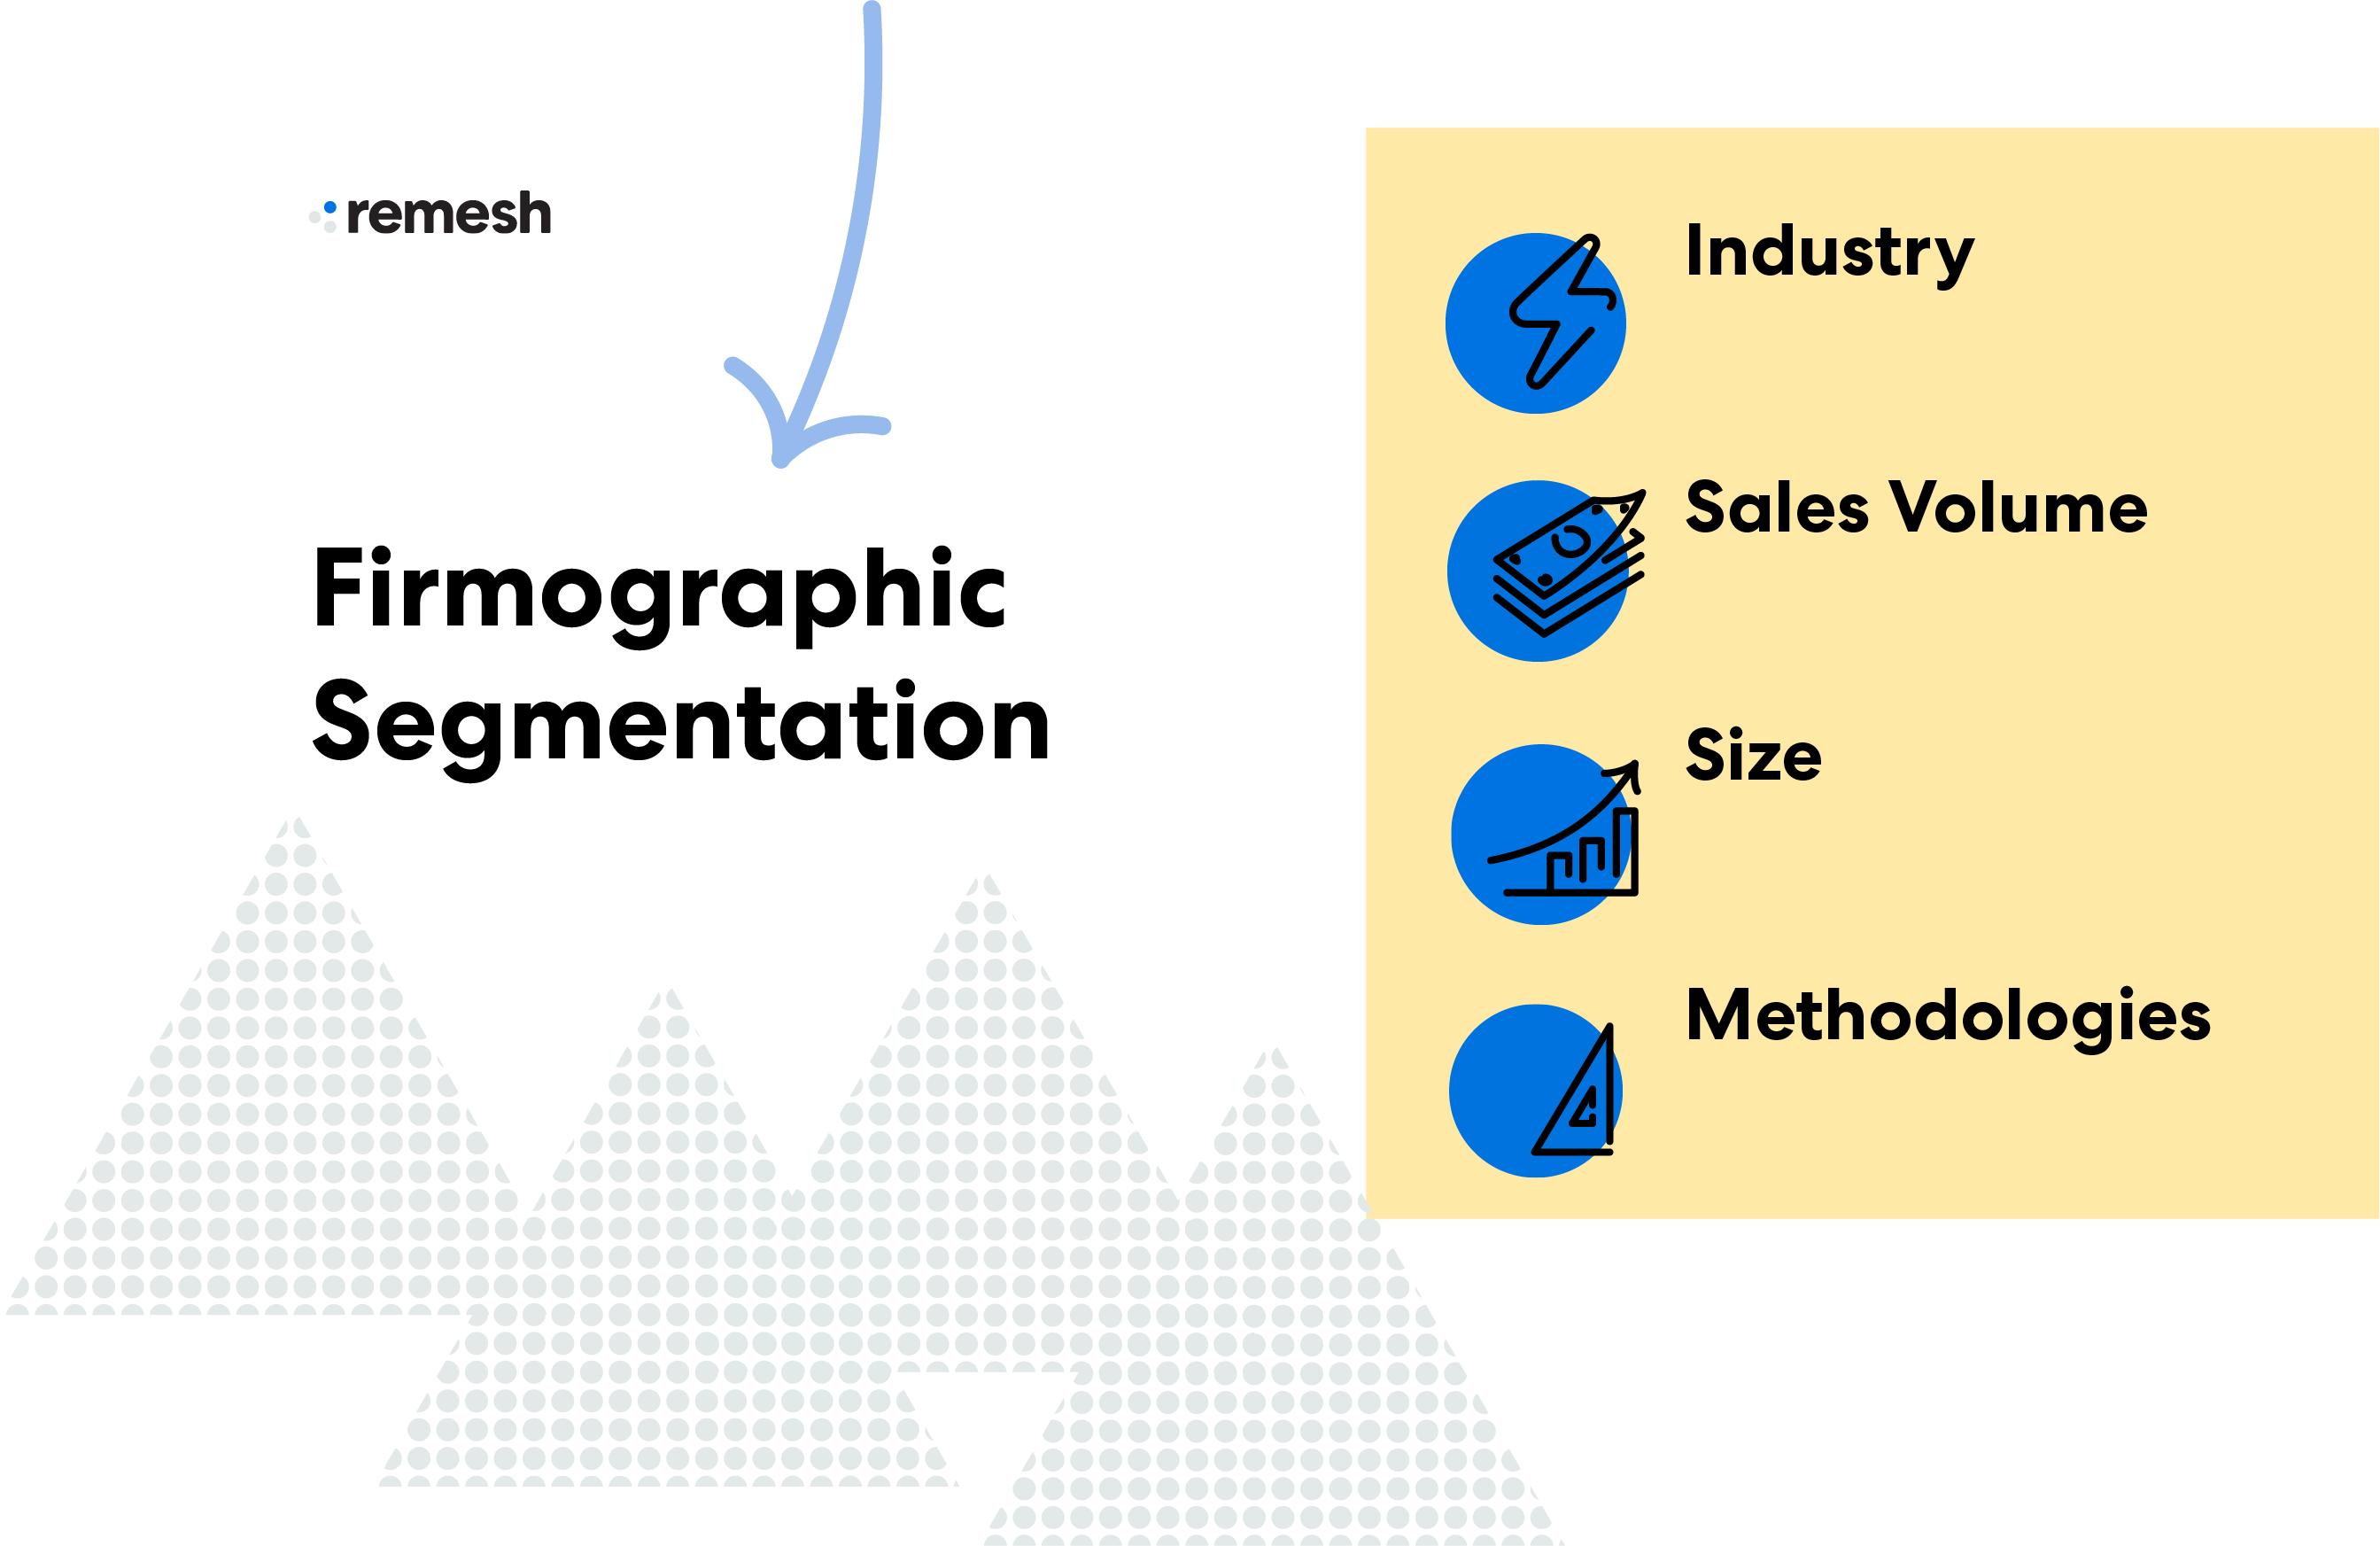 Firmographic Segmentation Visual